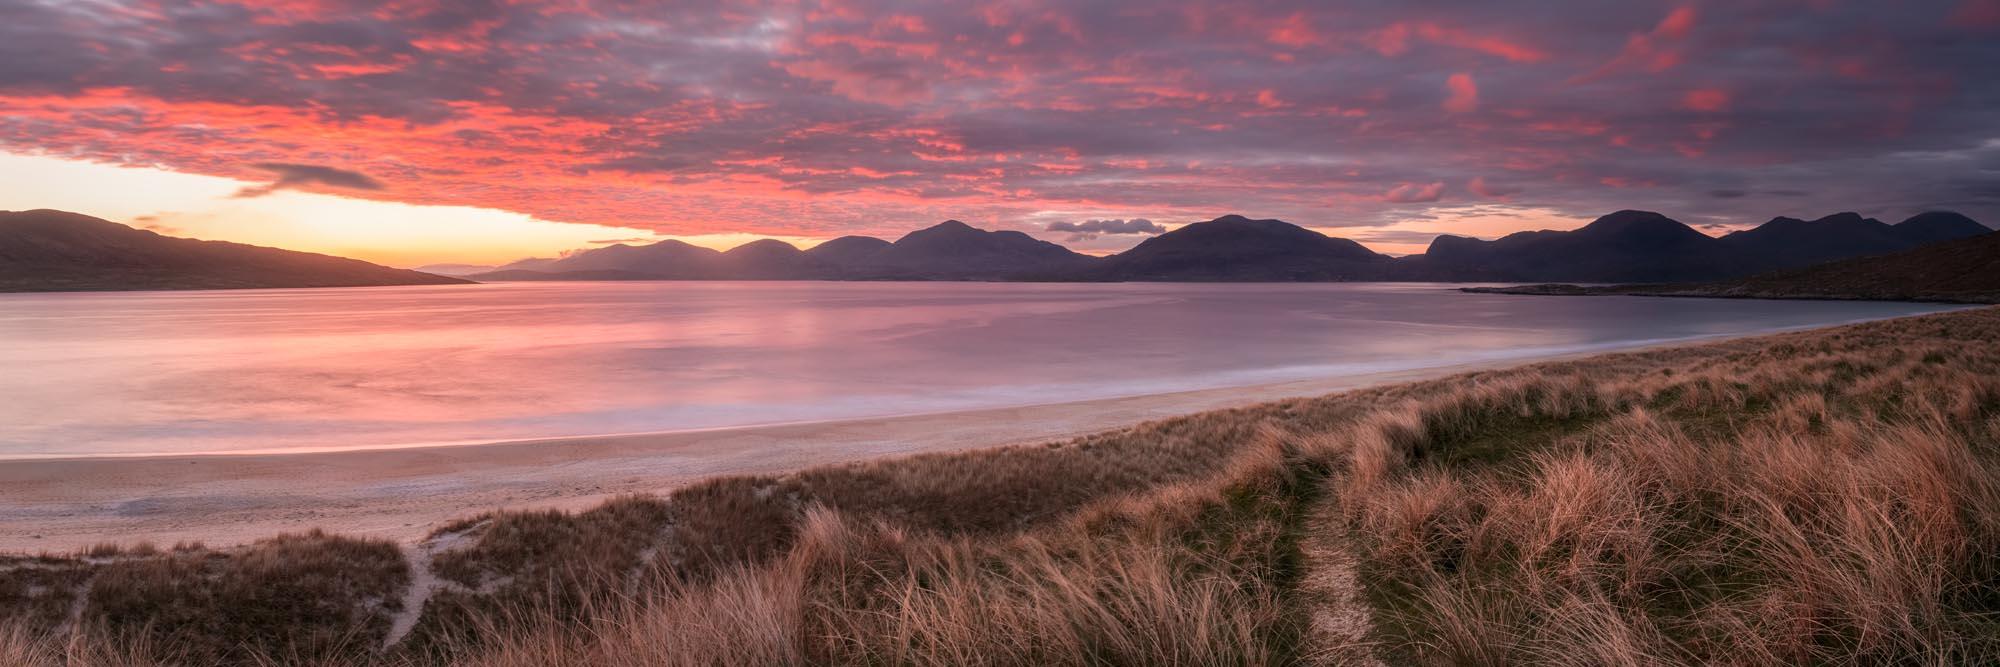 red sky sunset isle of Harris